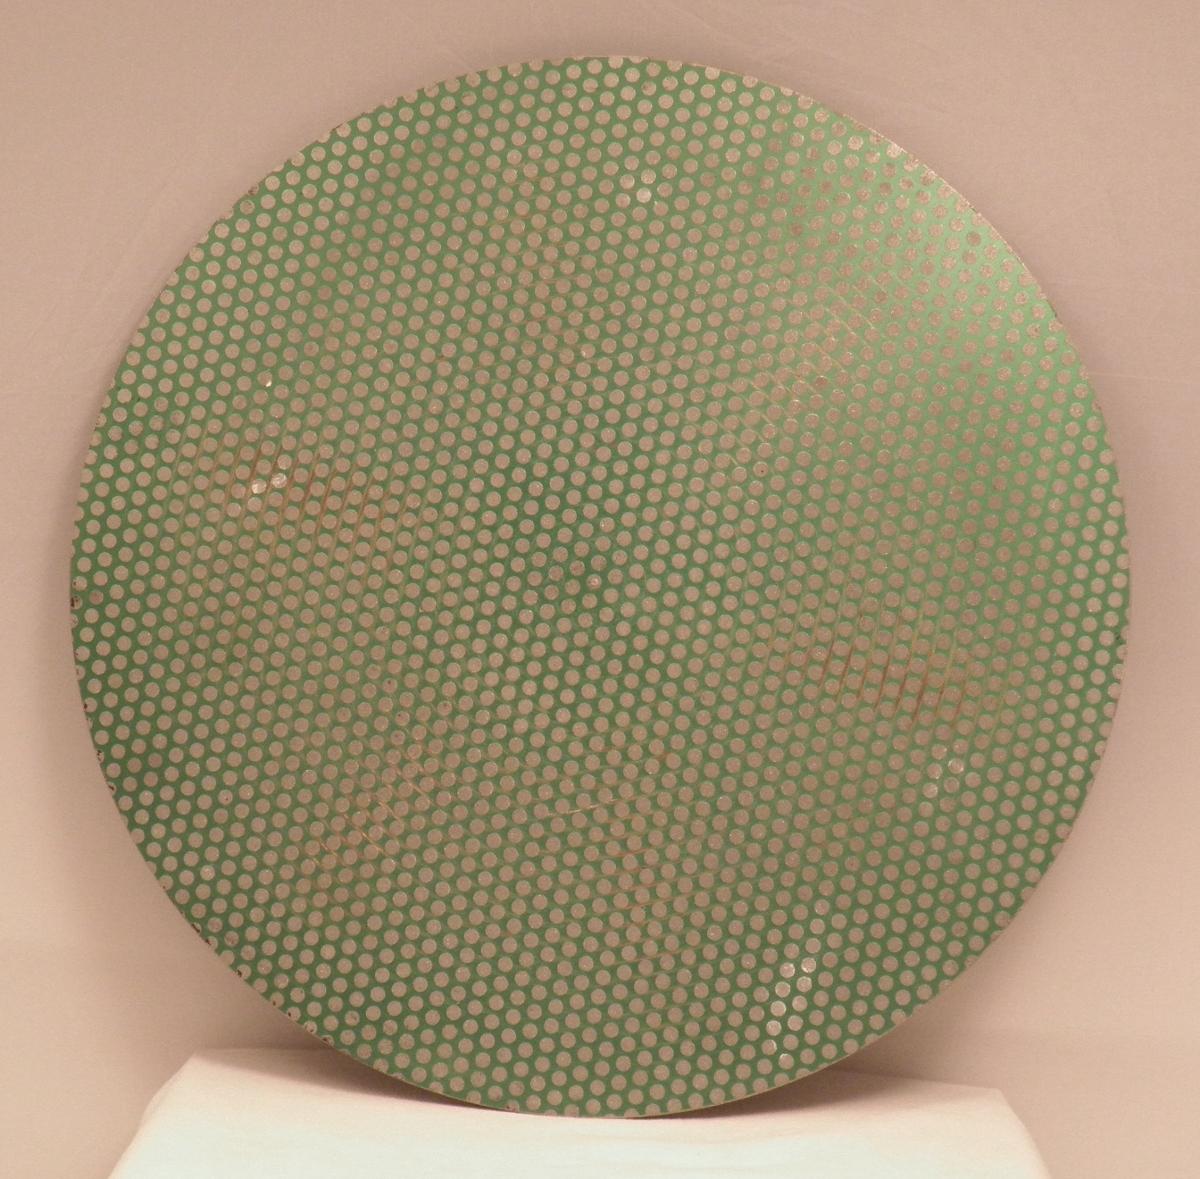 diamond-dot-15-inch-on-bat.jpg